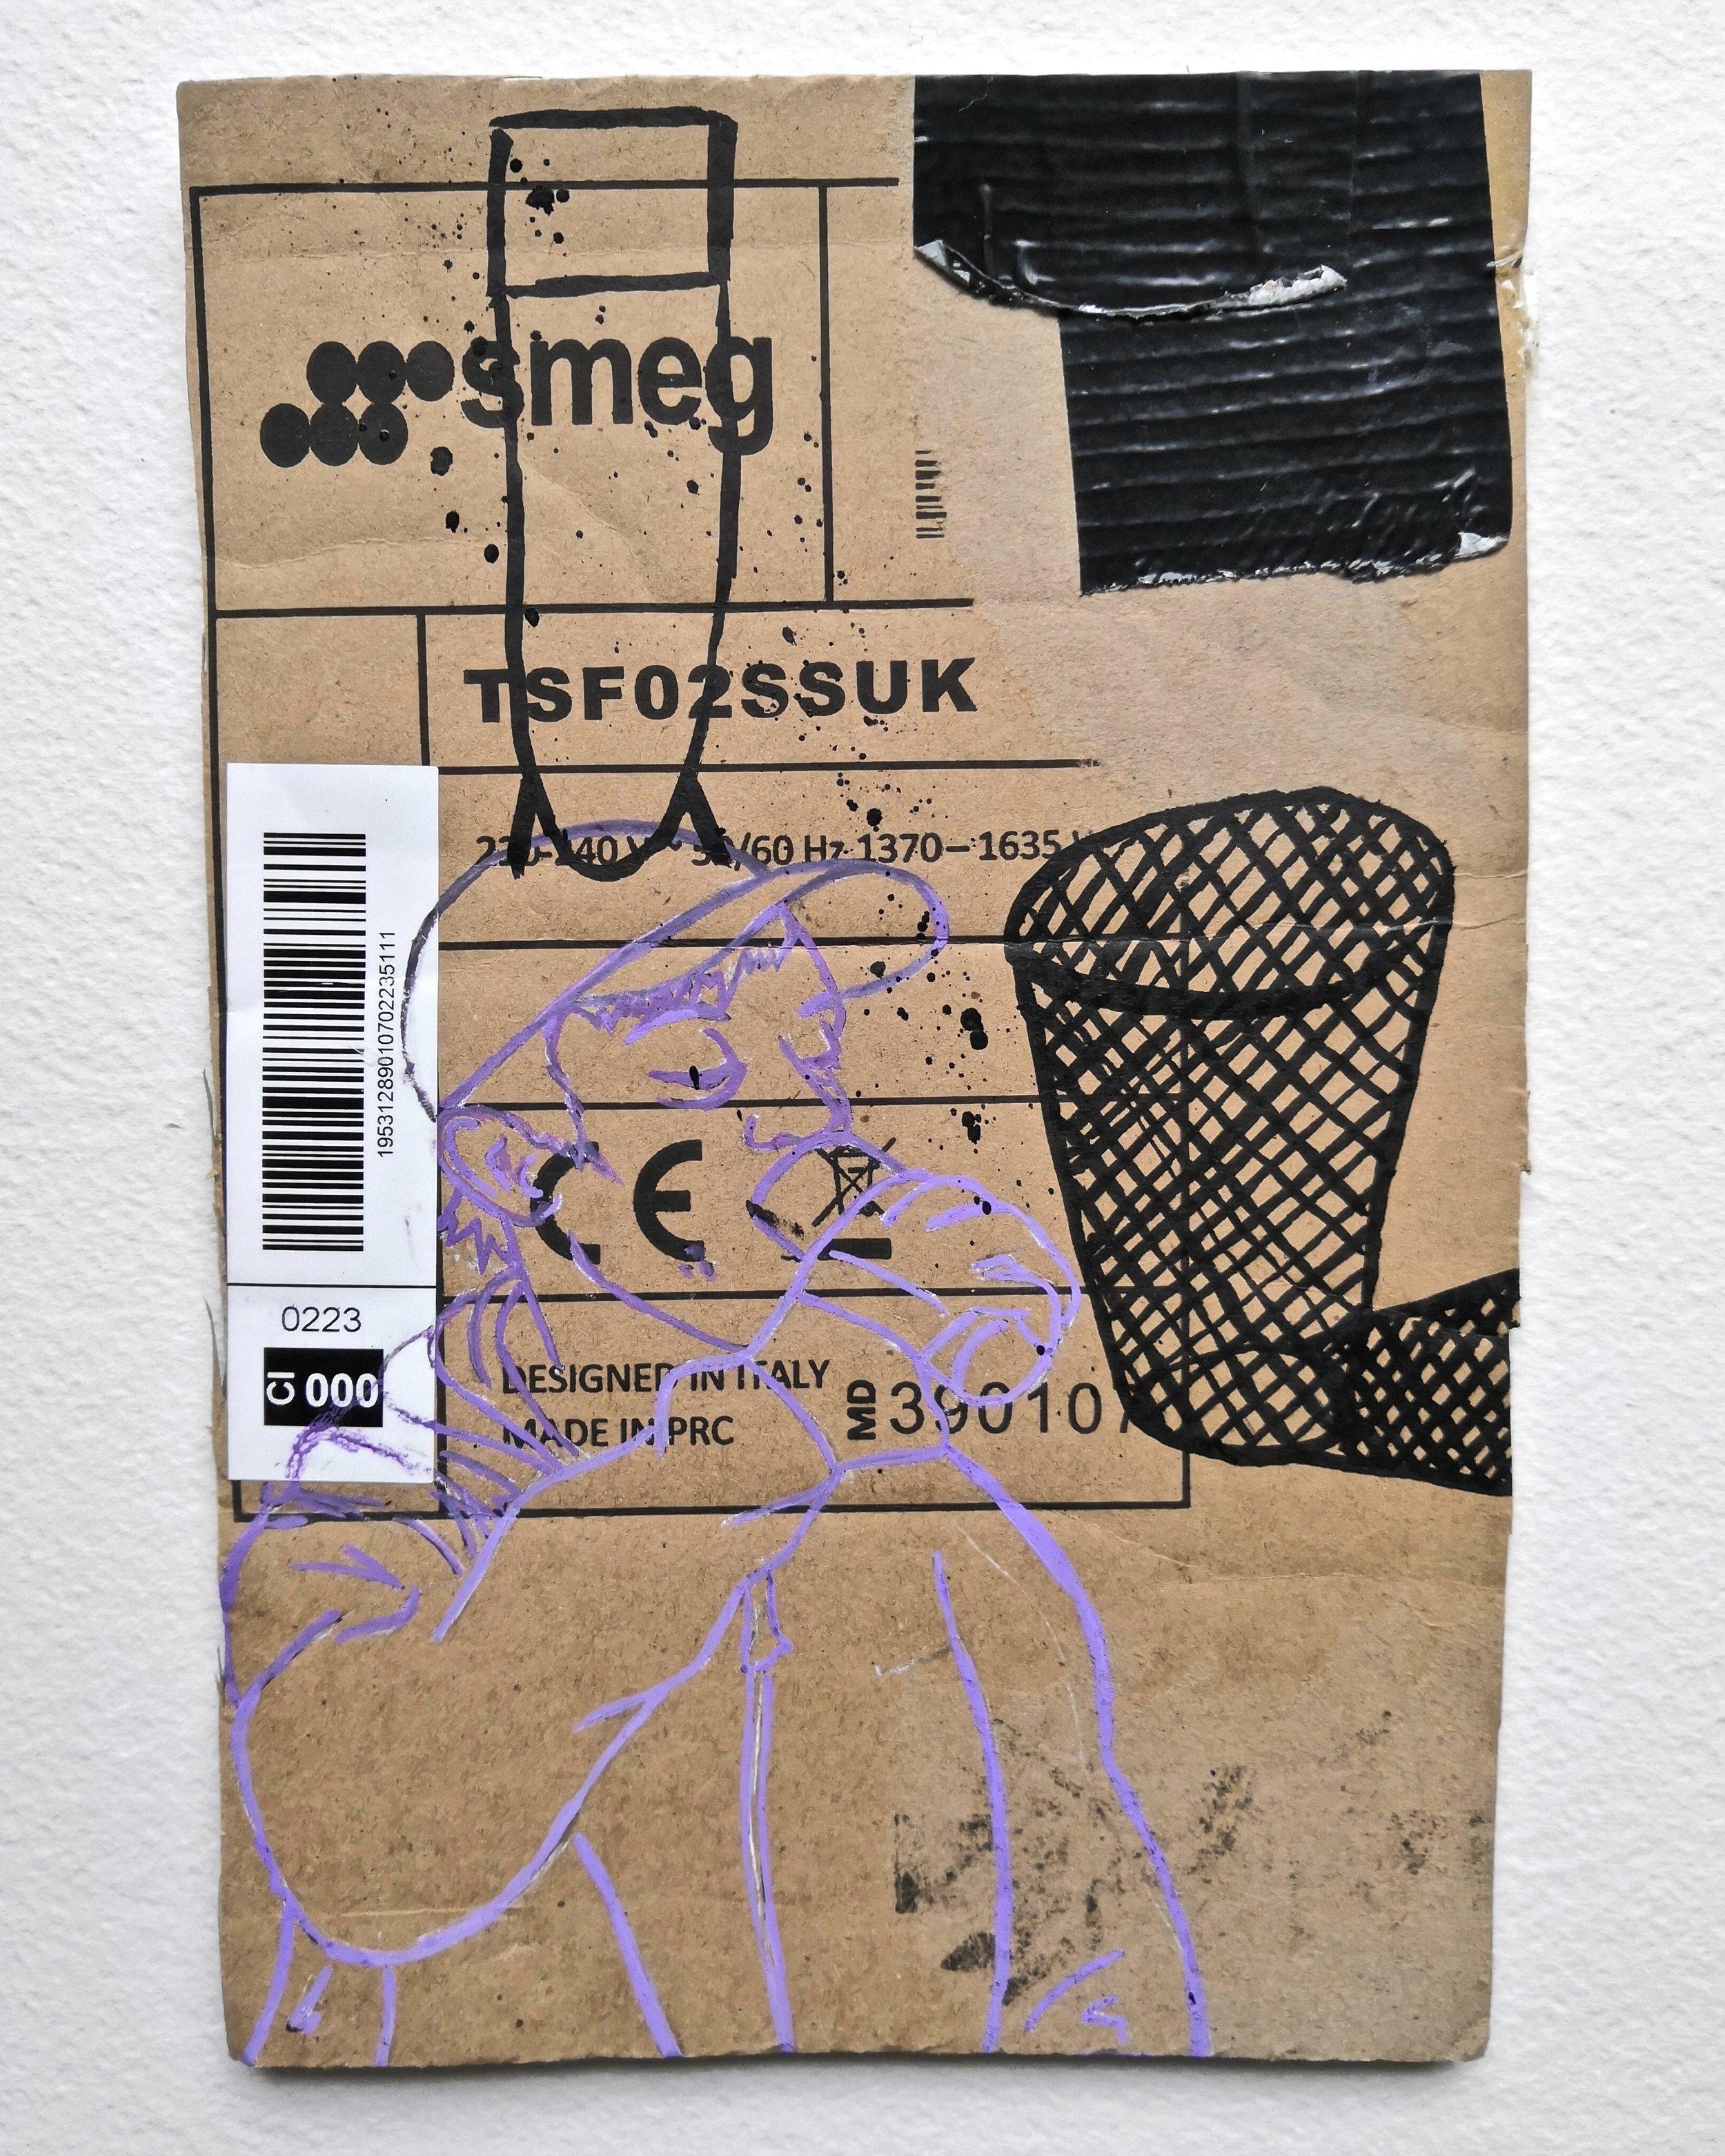 Smeg | Phill Hopkins & Jadene Imbusch (2019)